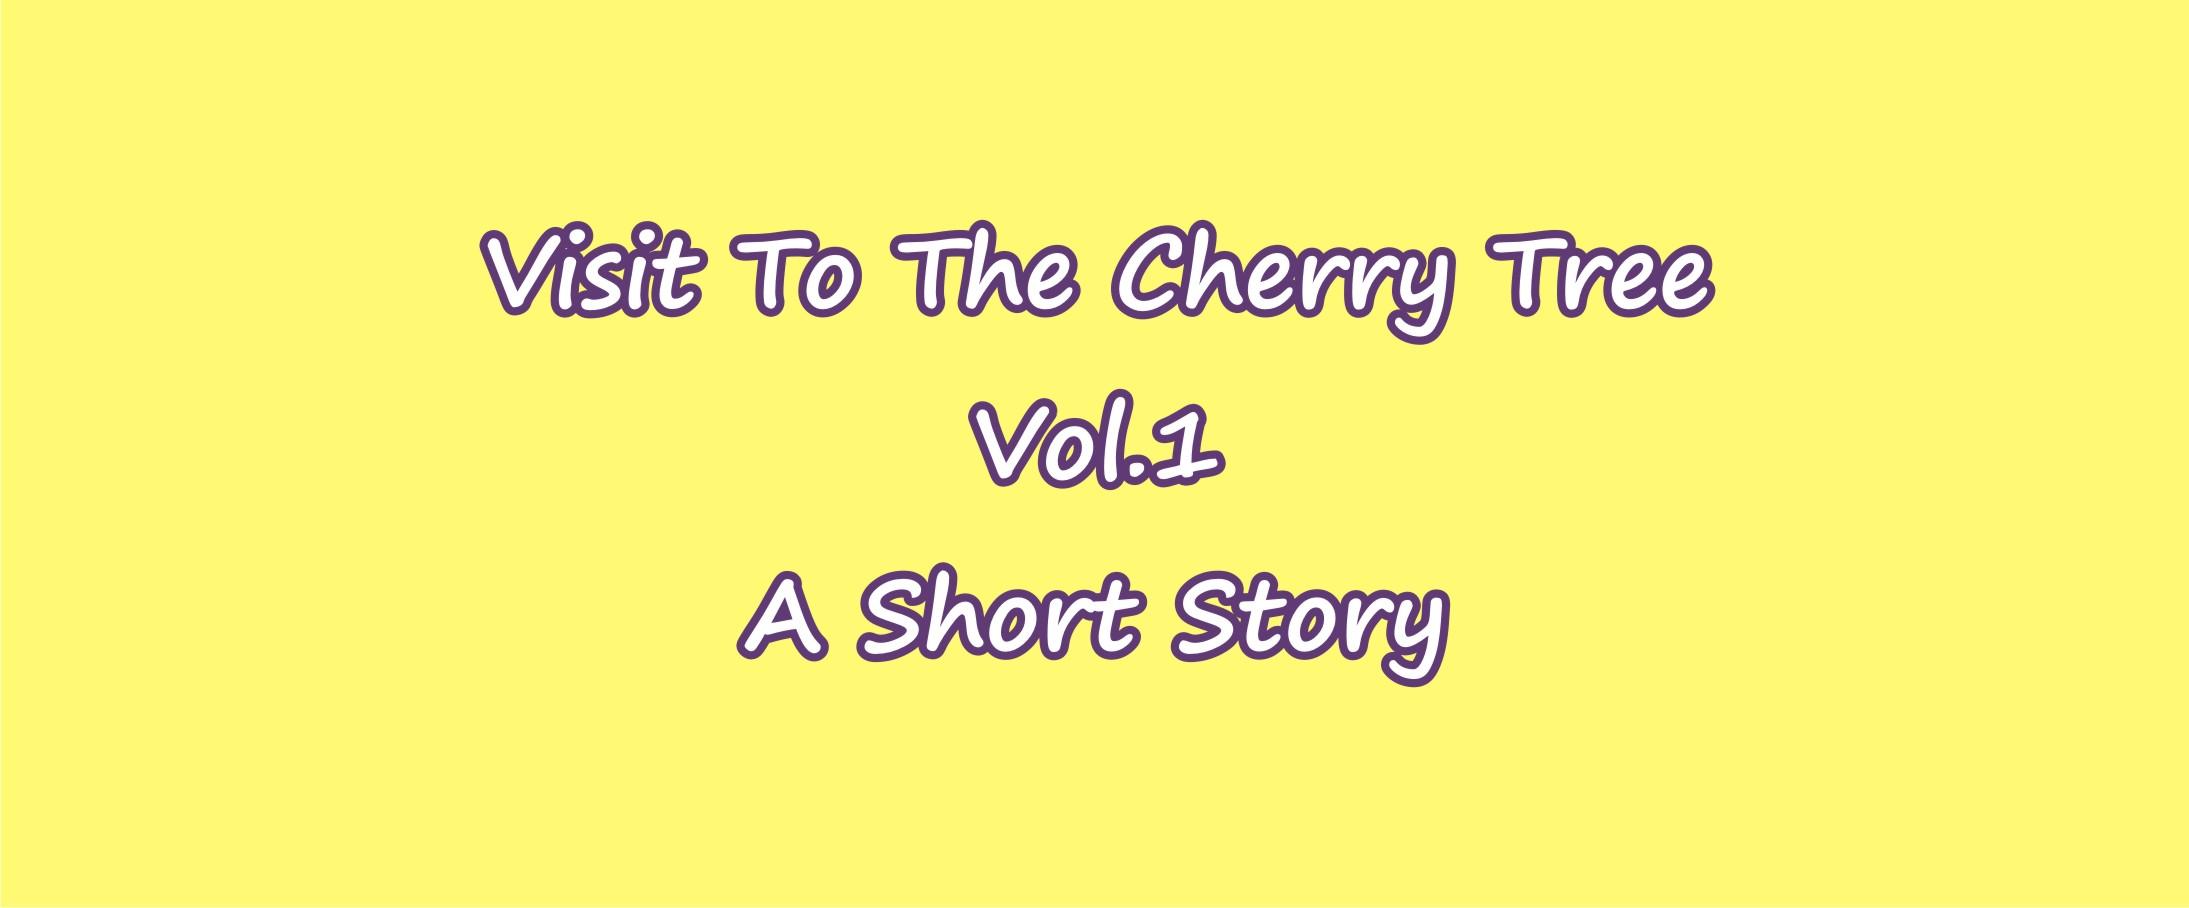 Visit to the Cherry tree Vol. 1